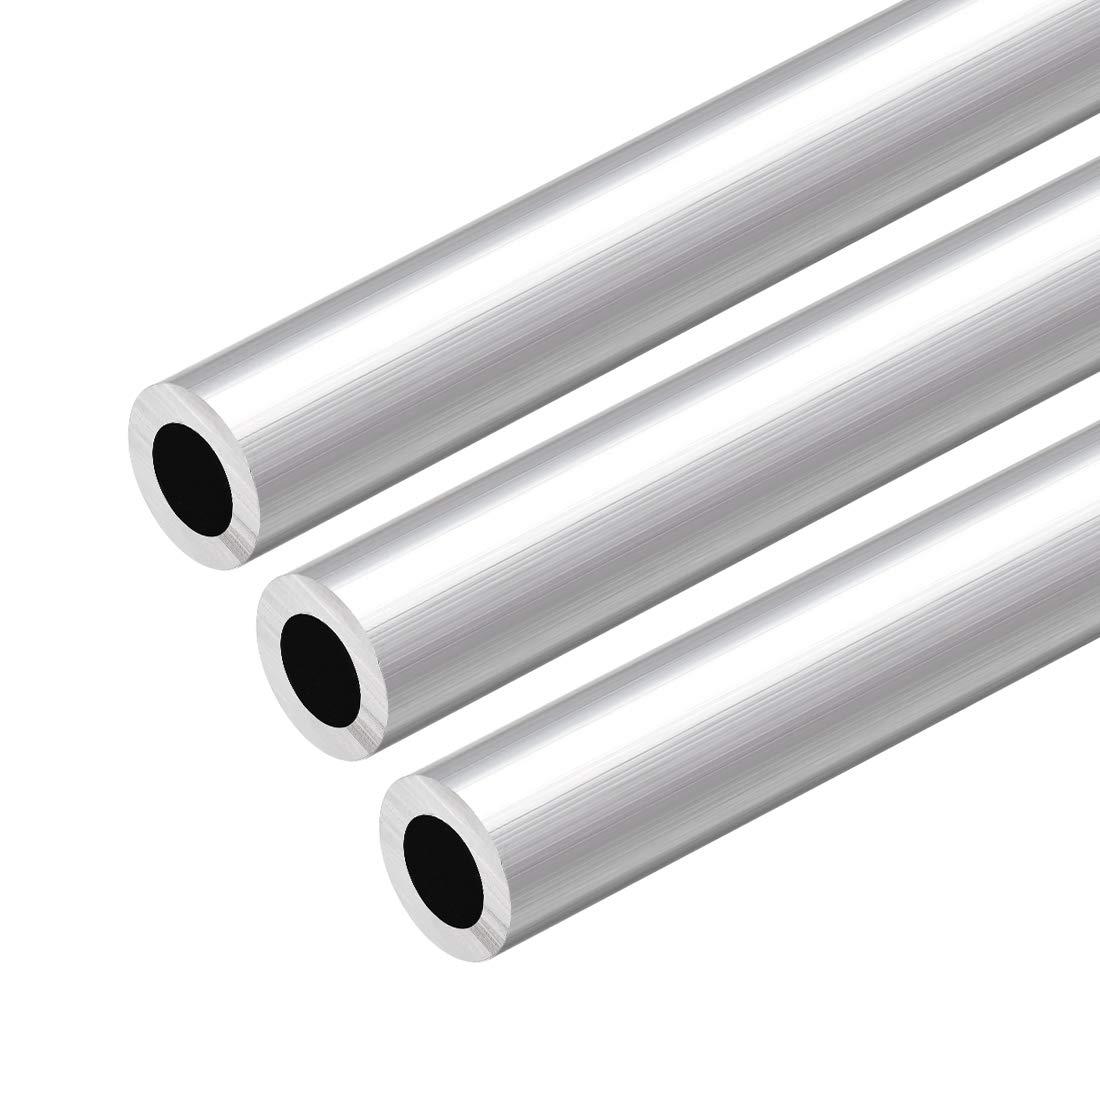 uxcell 6063 Aluminum Round Tube 300mm Length 18mm OD 15mm Inner Dia Seamless Aluminum Straight Tubing